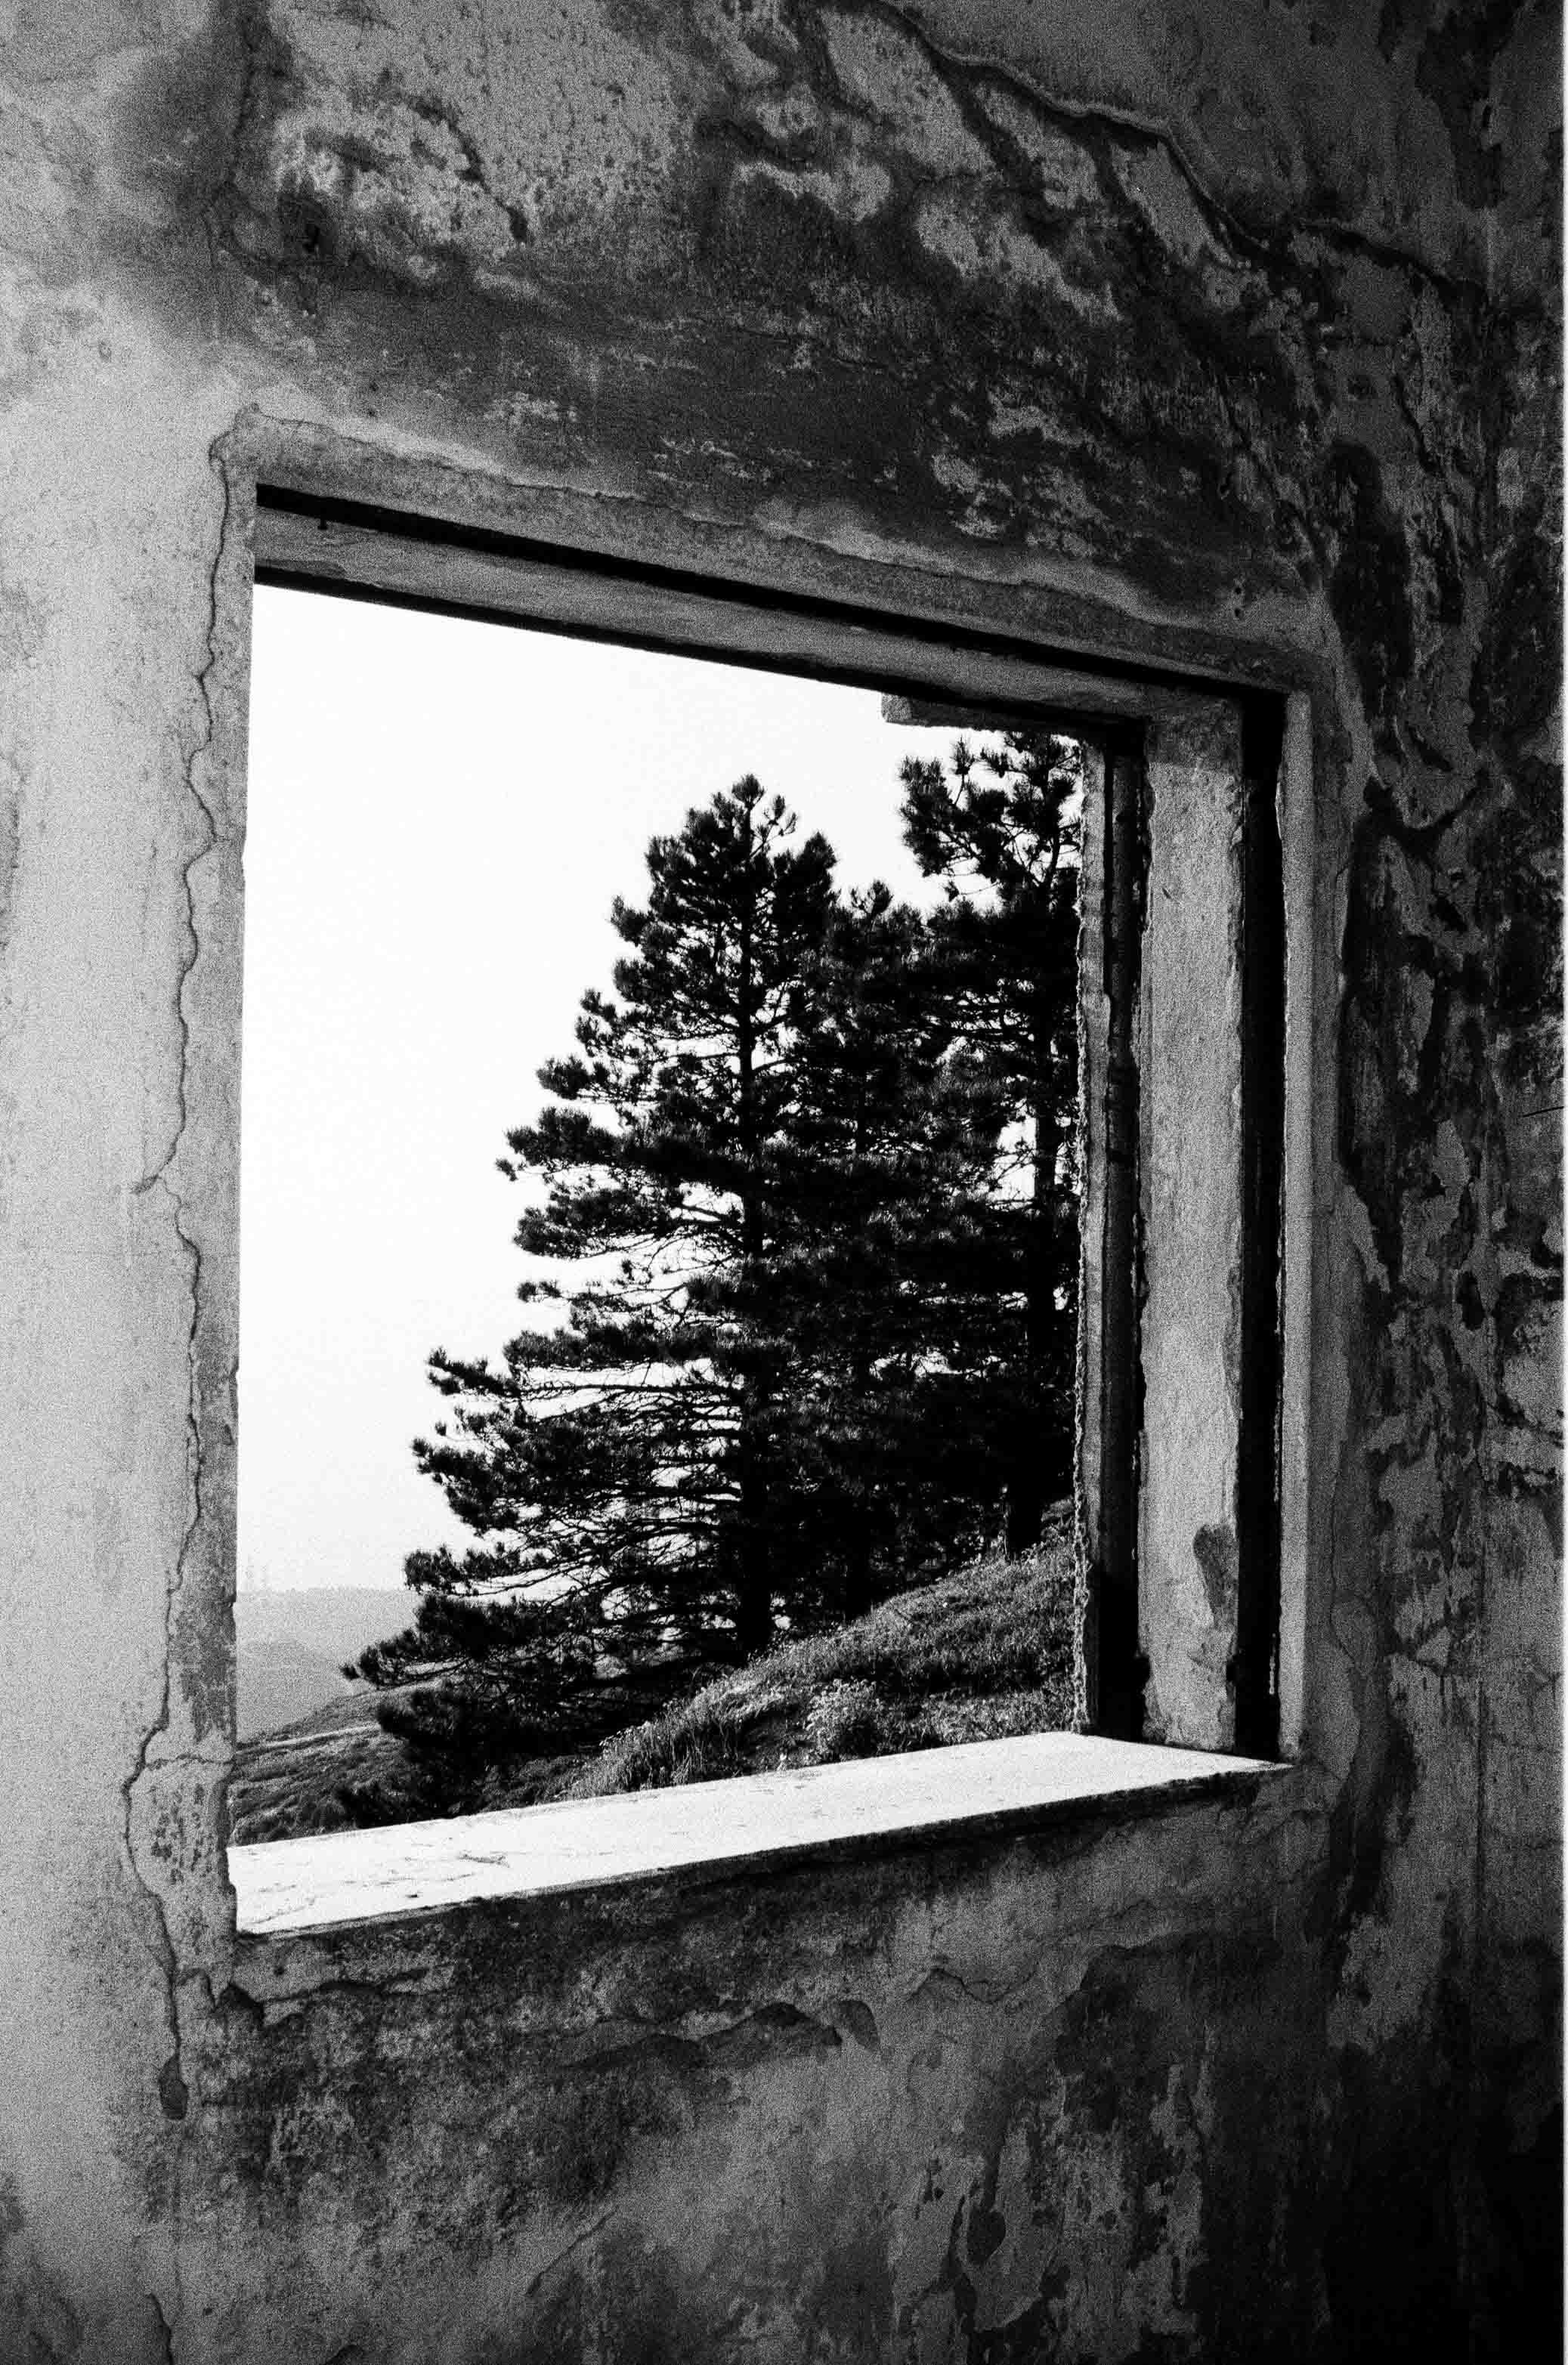 ChristosVourlis_photography_CVHAIR_CVDIARY_personal diary__film_35mm_0027_27A.jpg